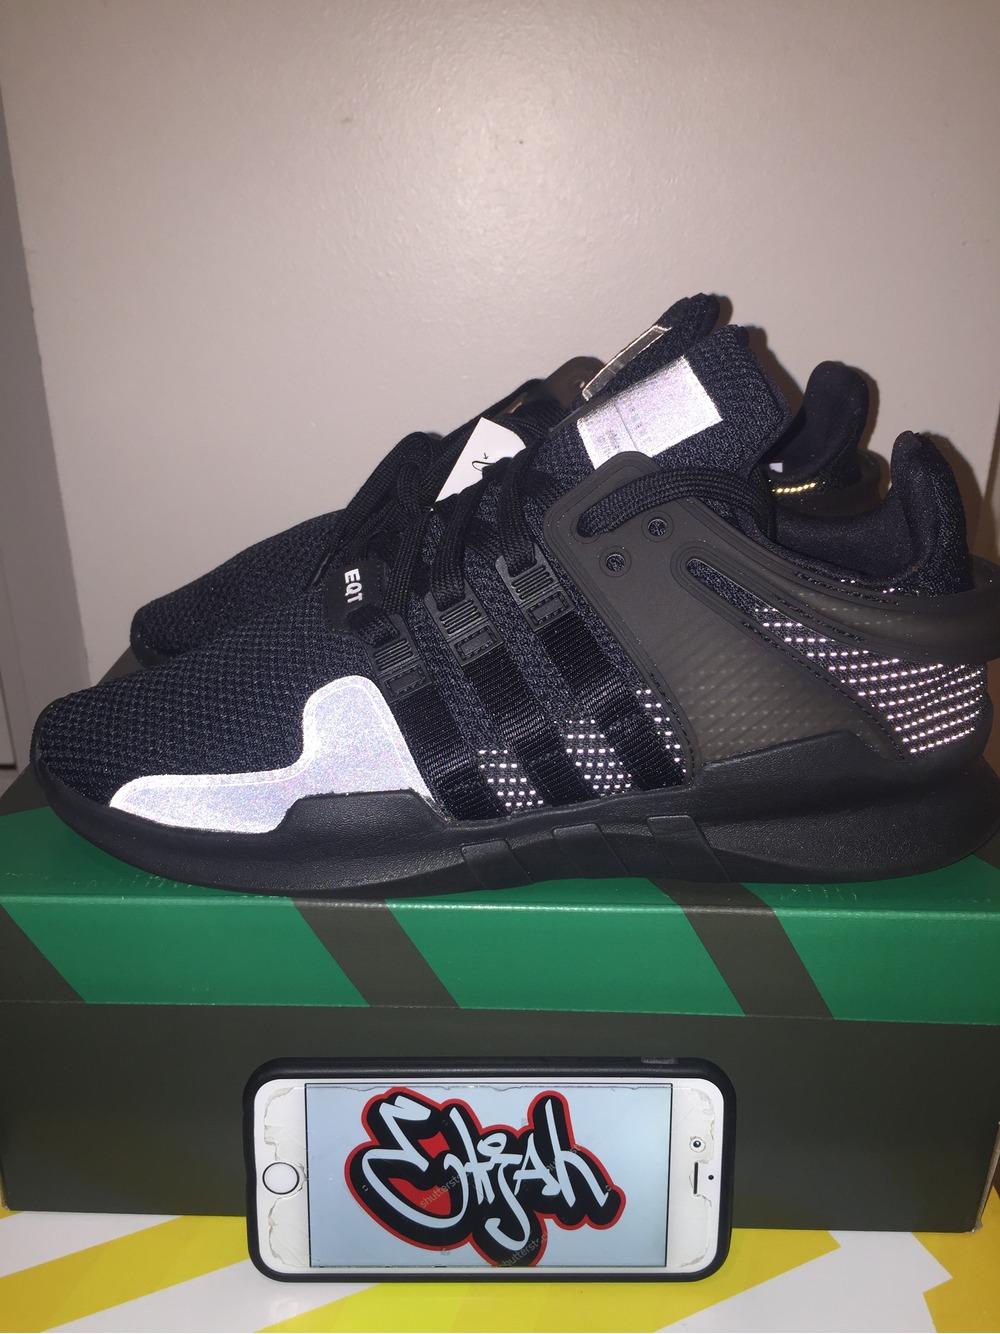 size 40 67c90 8af28 ... low cost adidas eqt adv sz us8.5 black on black reflective first drop  ba8324